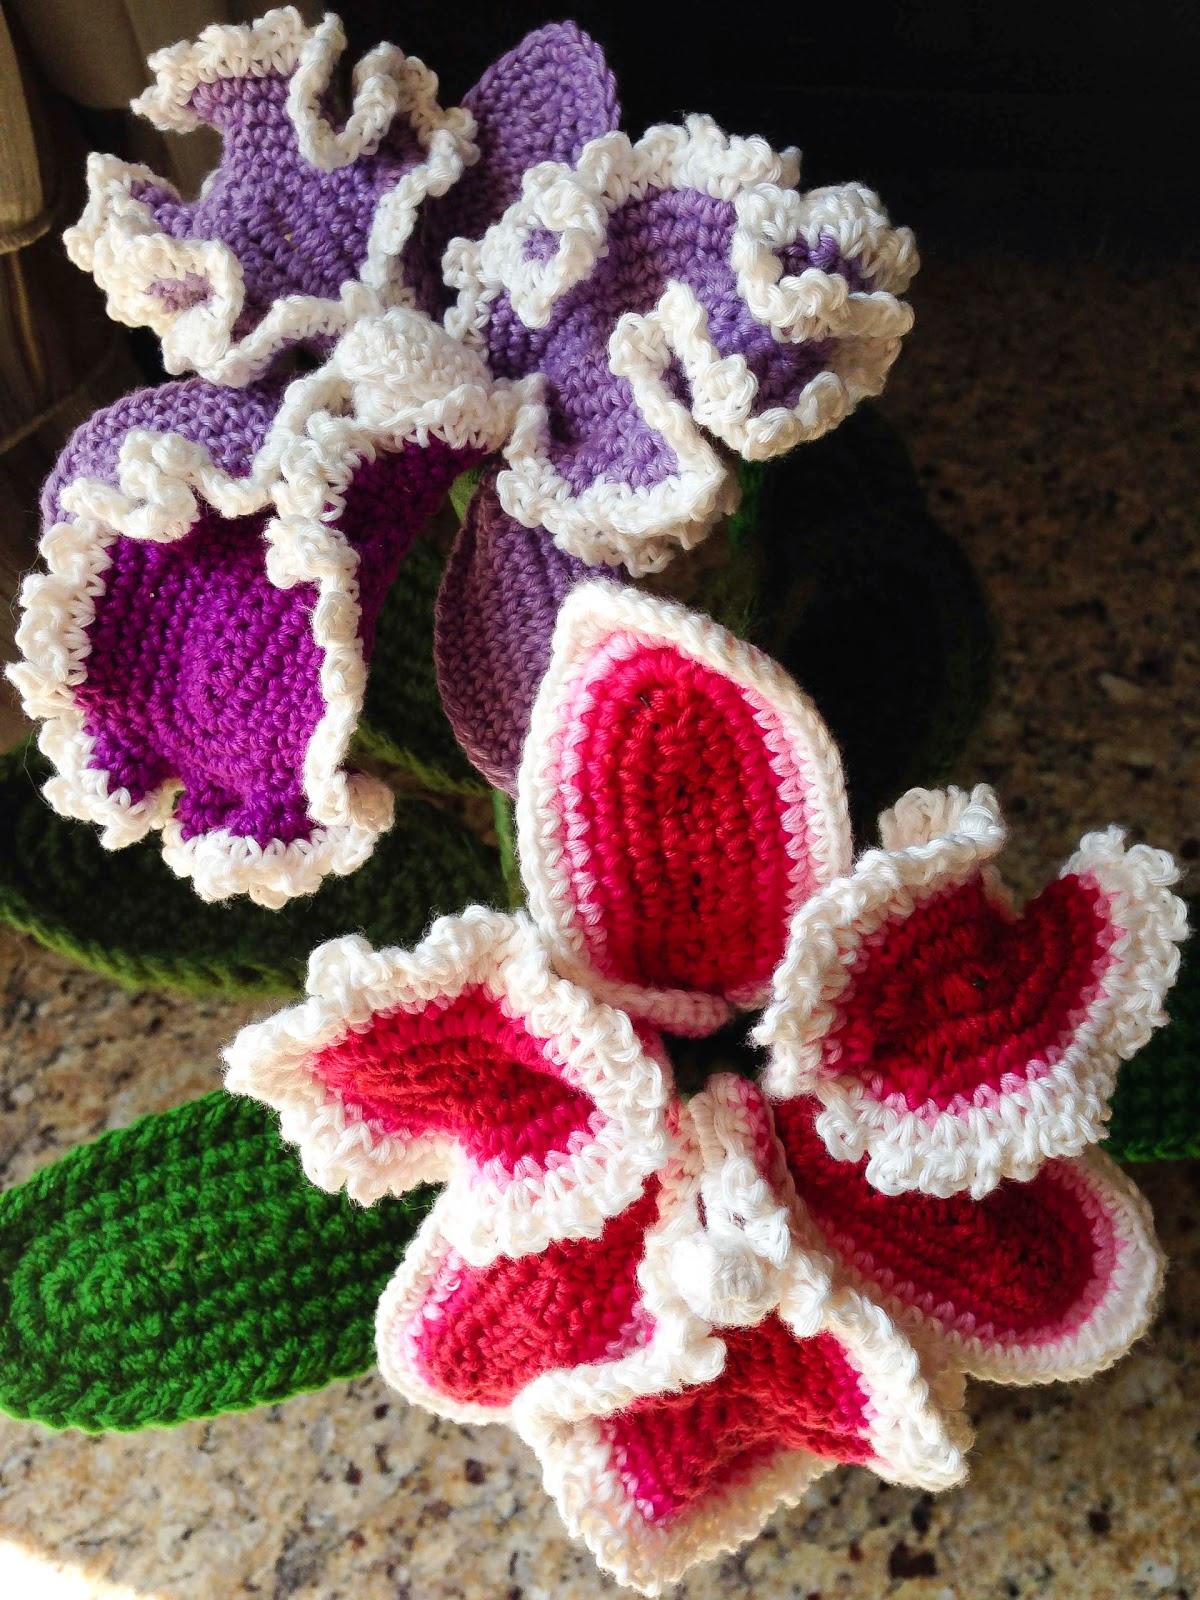 Crochet Free Patterns To Download : crochet rockstar: Cattleya Orchid Crochet Flower